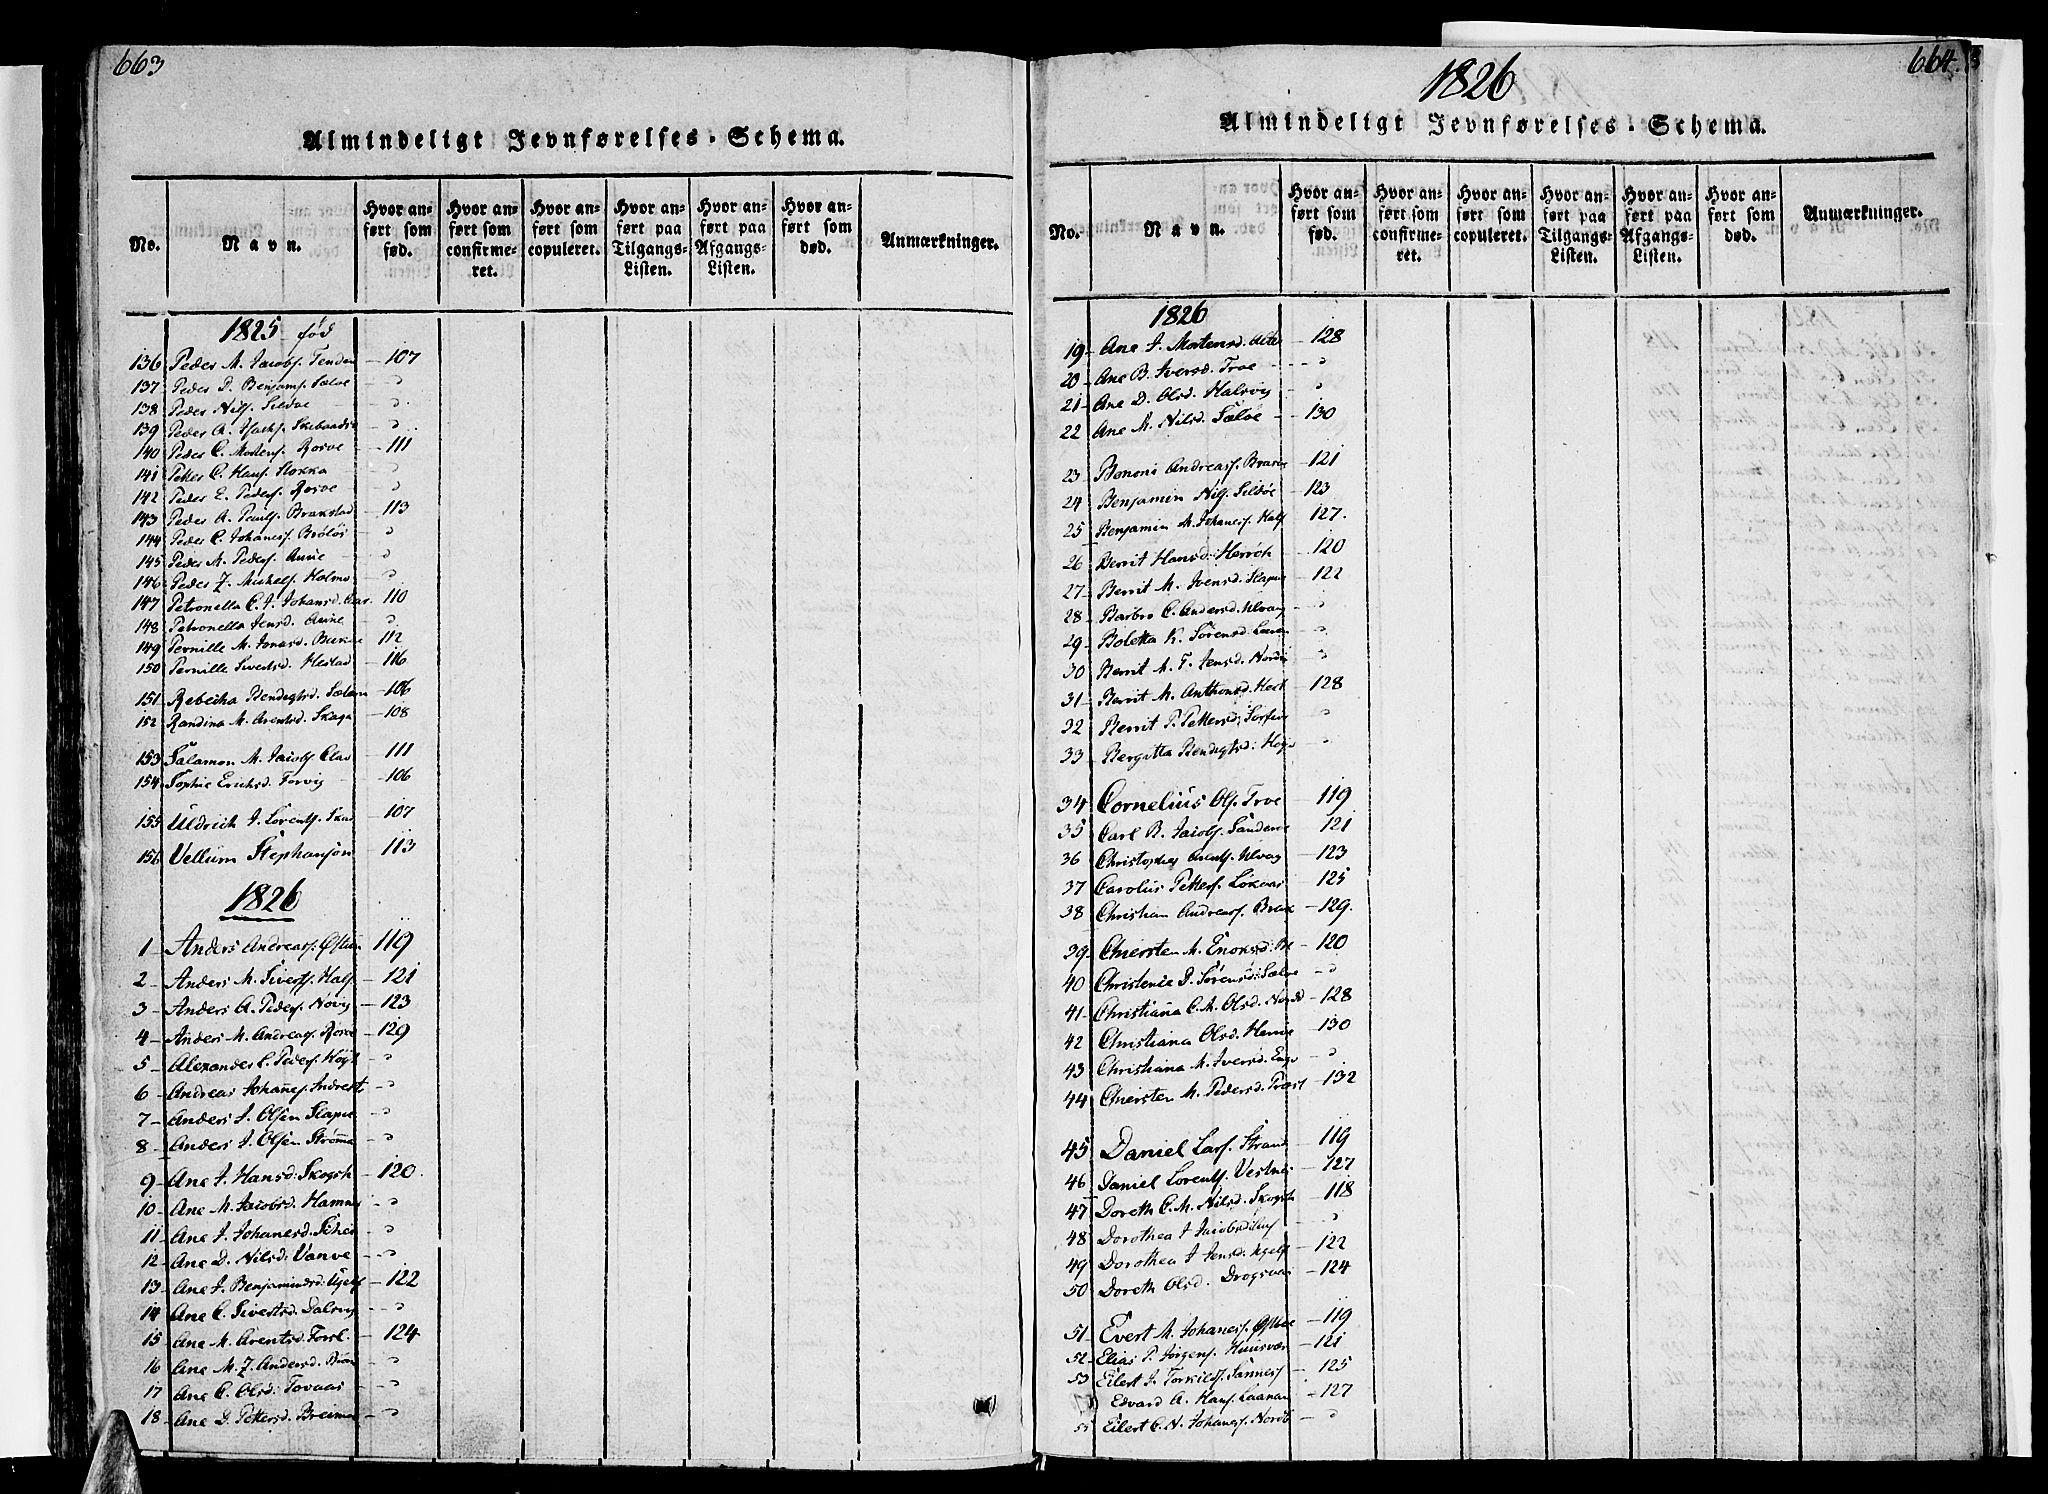 SAT, Ministerialprotokoller, klokkerbøker og fødselsregistre - Nordland, 830/L0445: Ministerialbok nr. 830A09, 1820-1830, s. 663-664